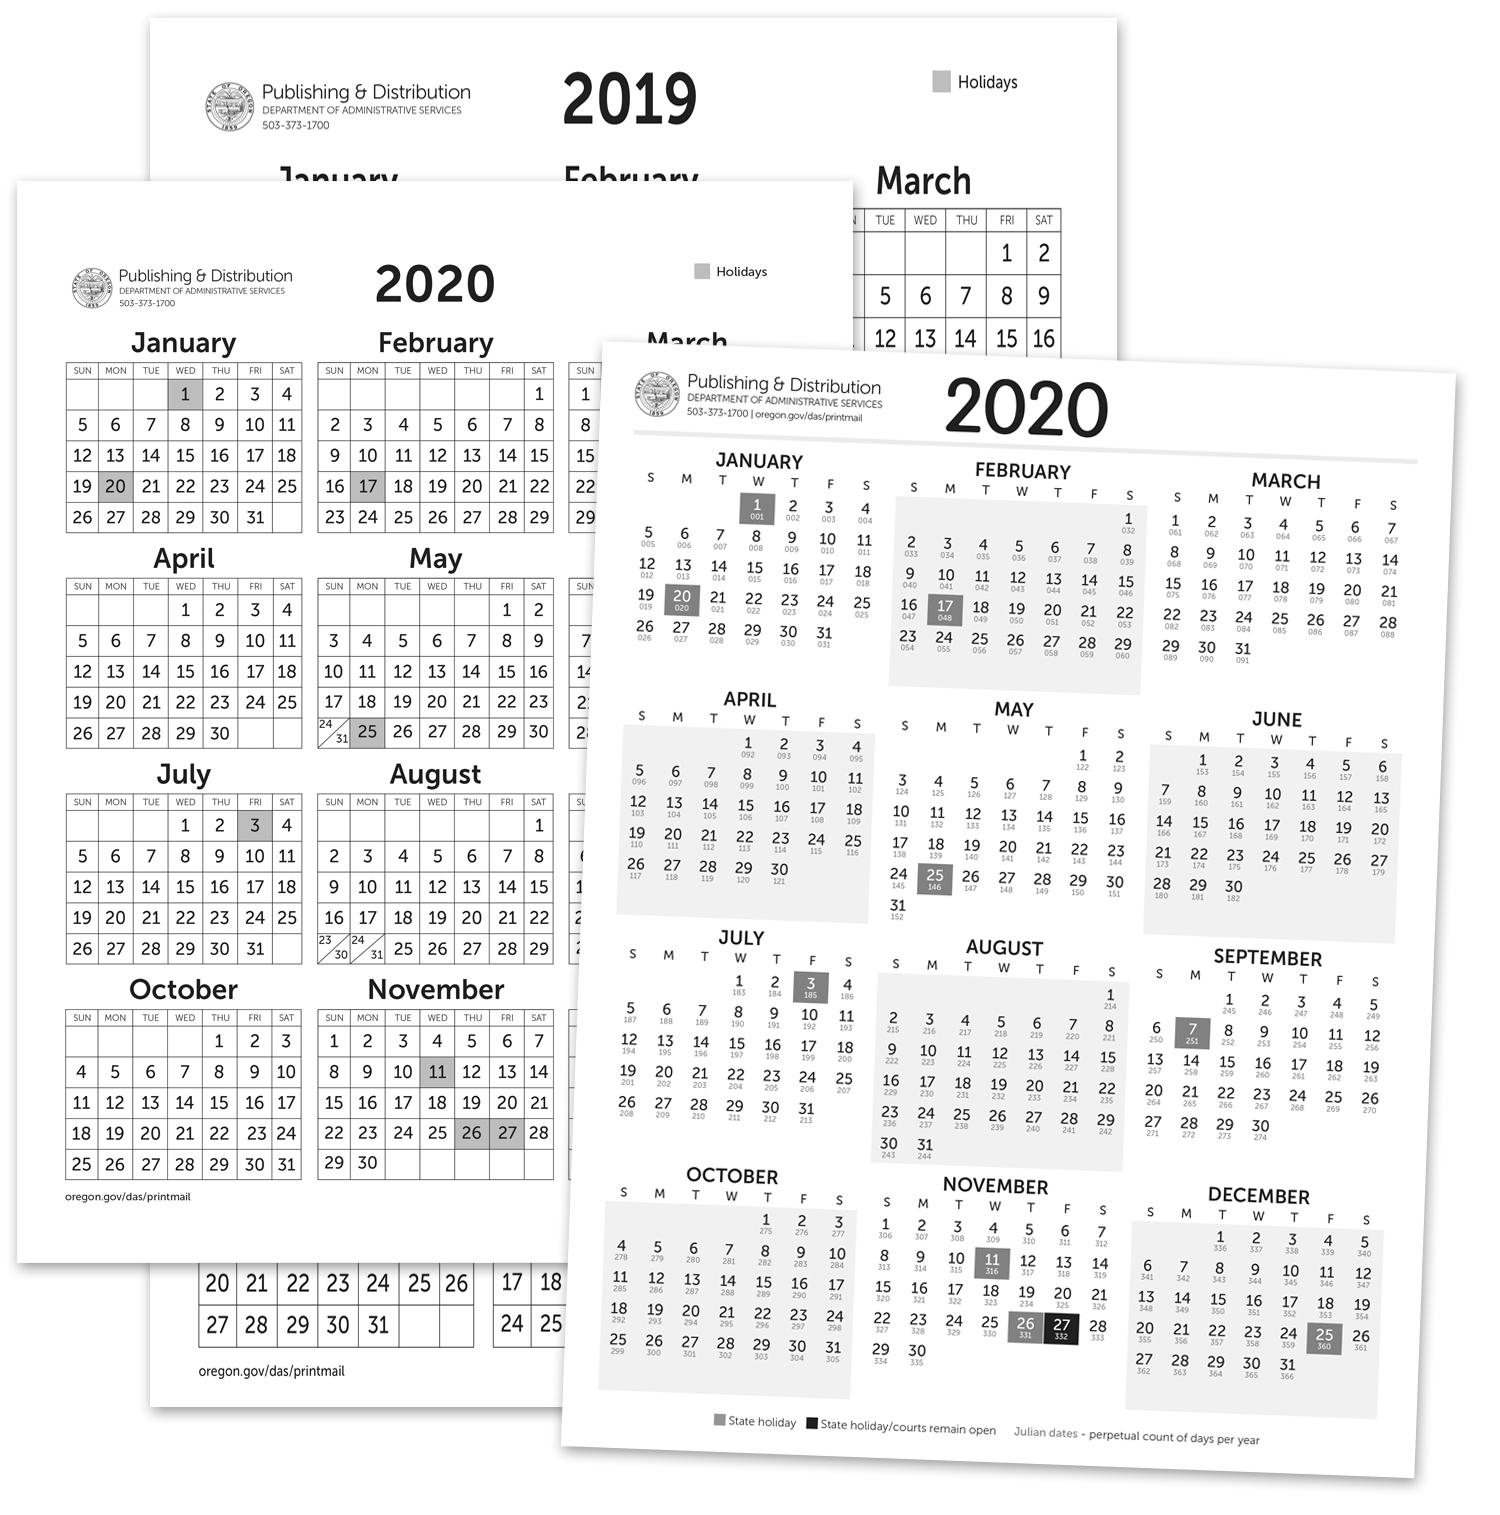 Bangla Calendar 2019 Pdf  Google Search with Uc Berkeley Calendar 2020-2020